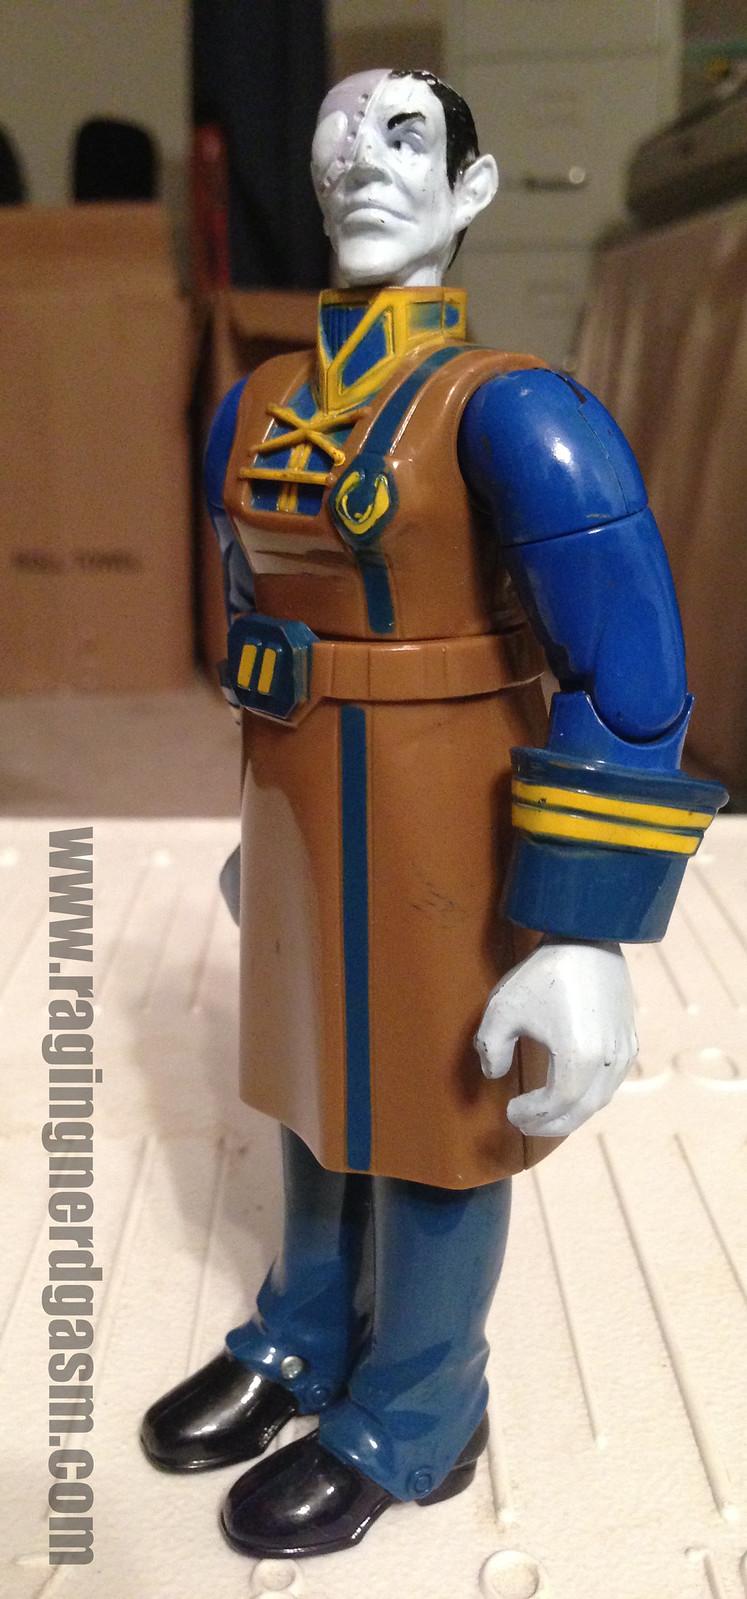 Vintage Robotech figure (1)